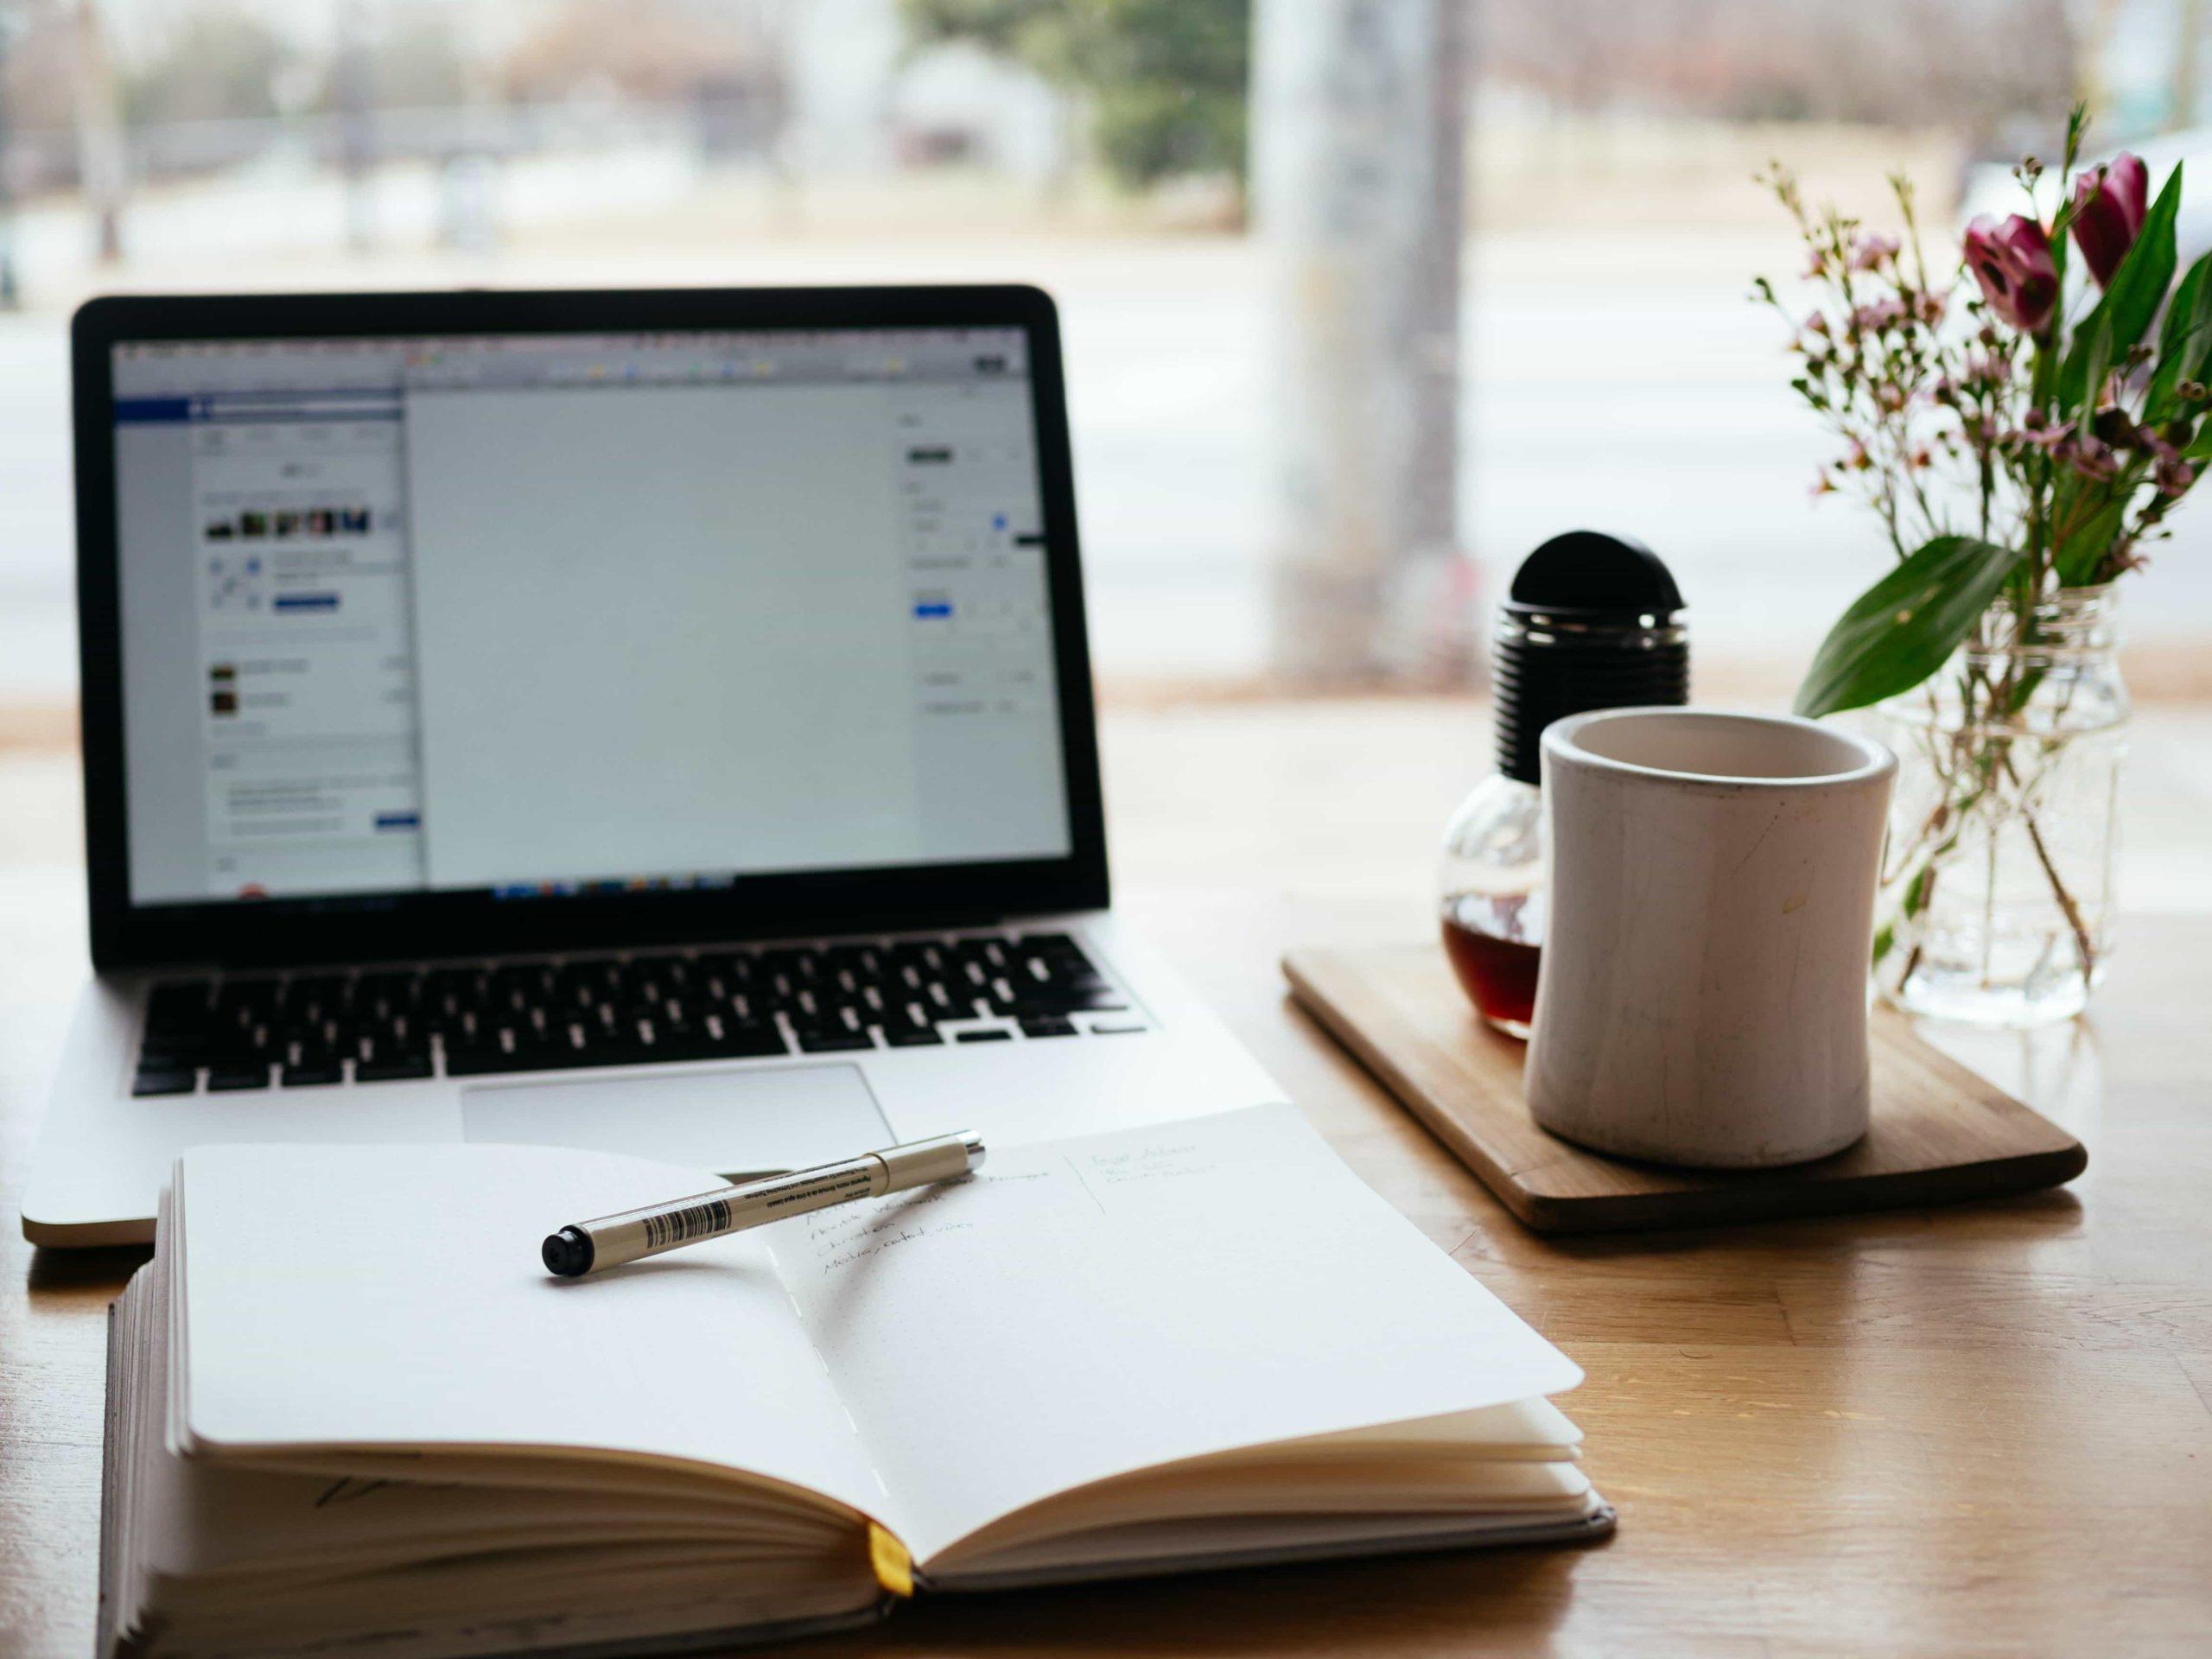 macbook-pro-15-student